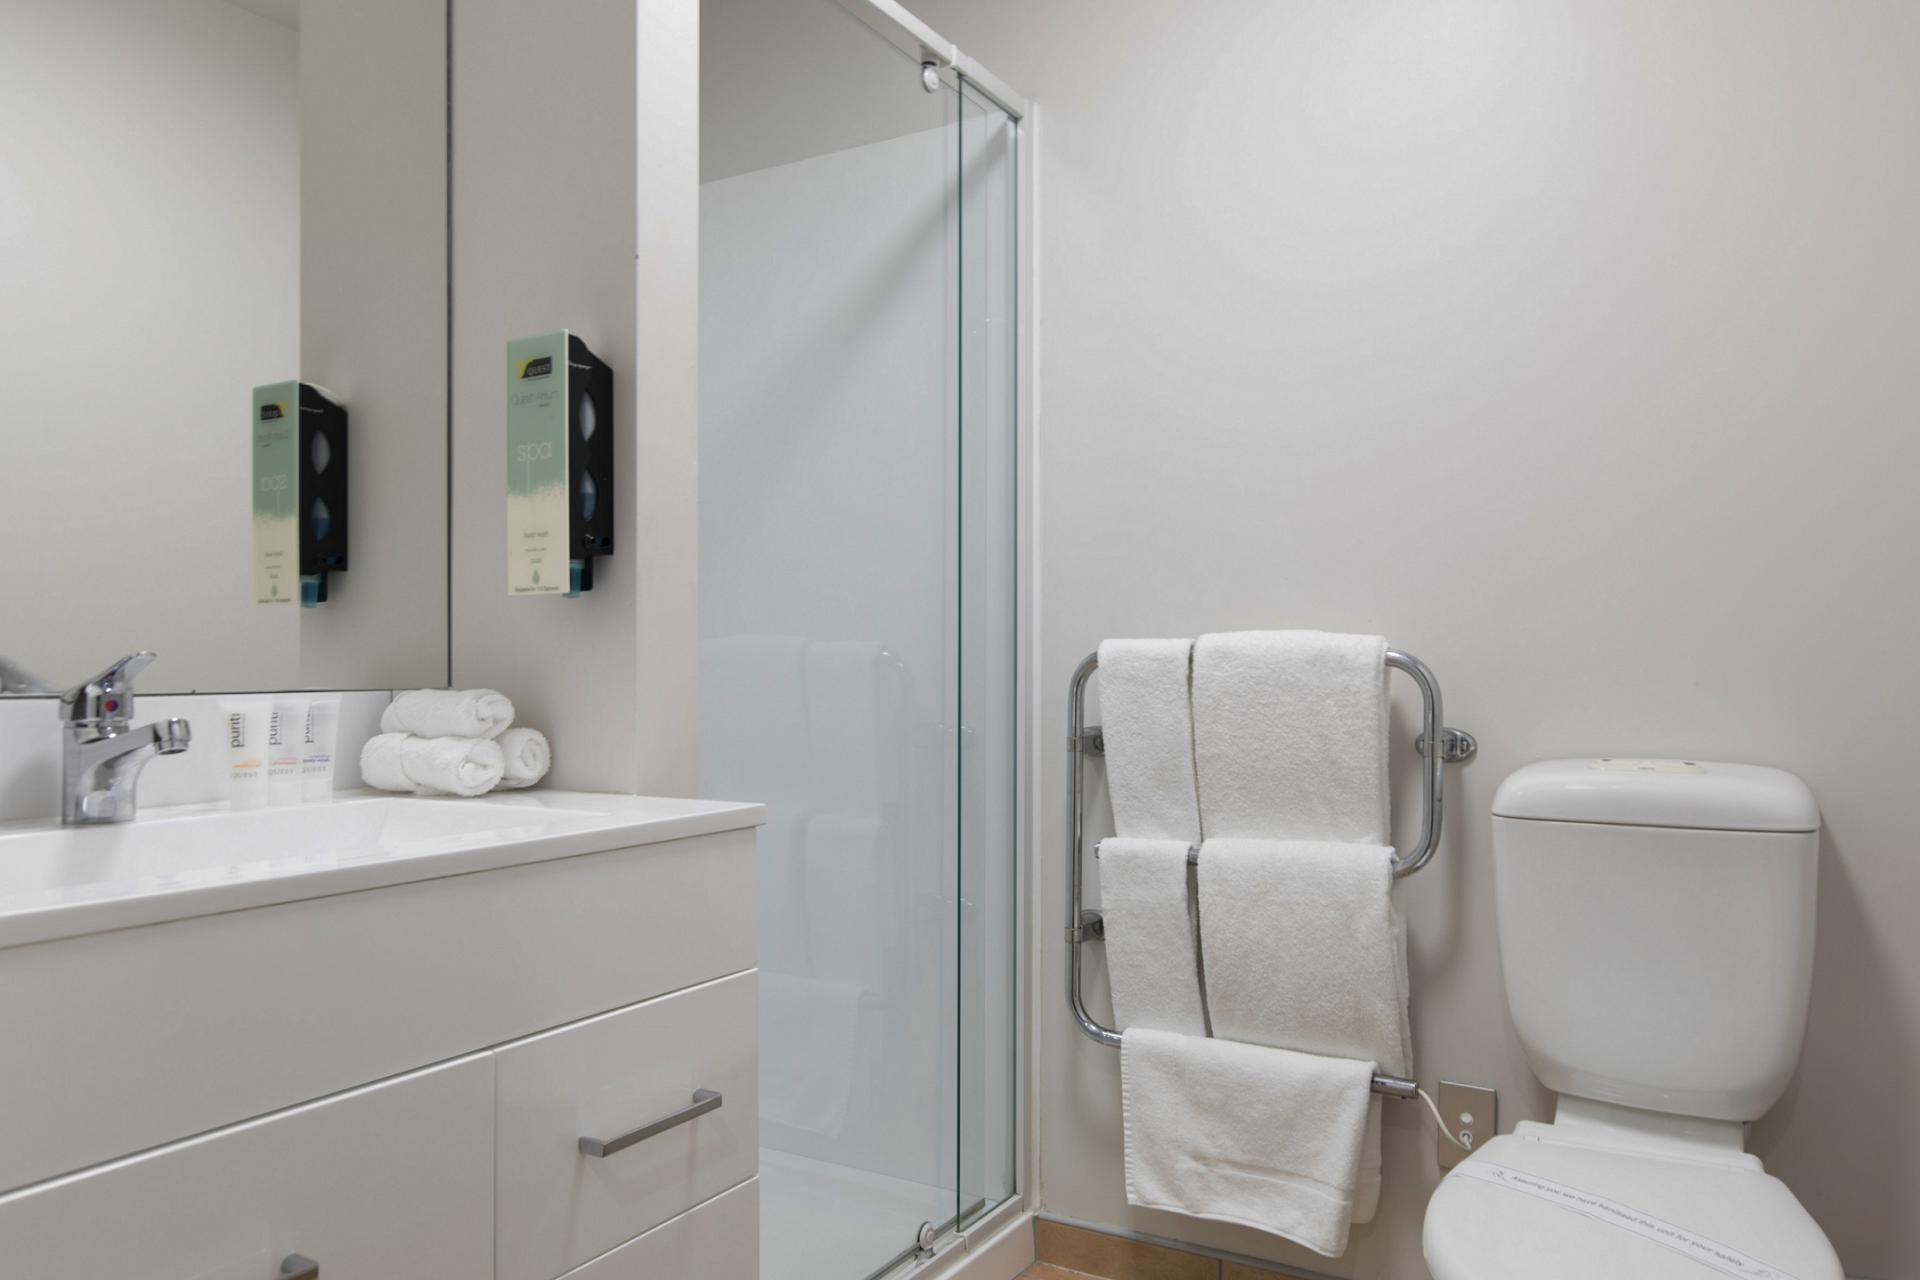 Charming bathroom in Quest Atrium - Citybase Apartments